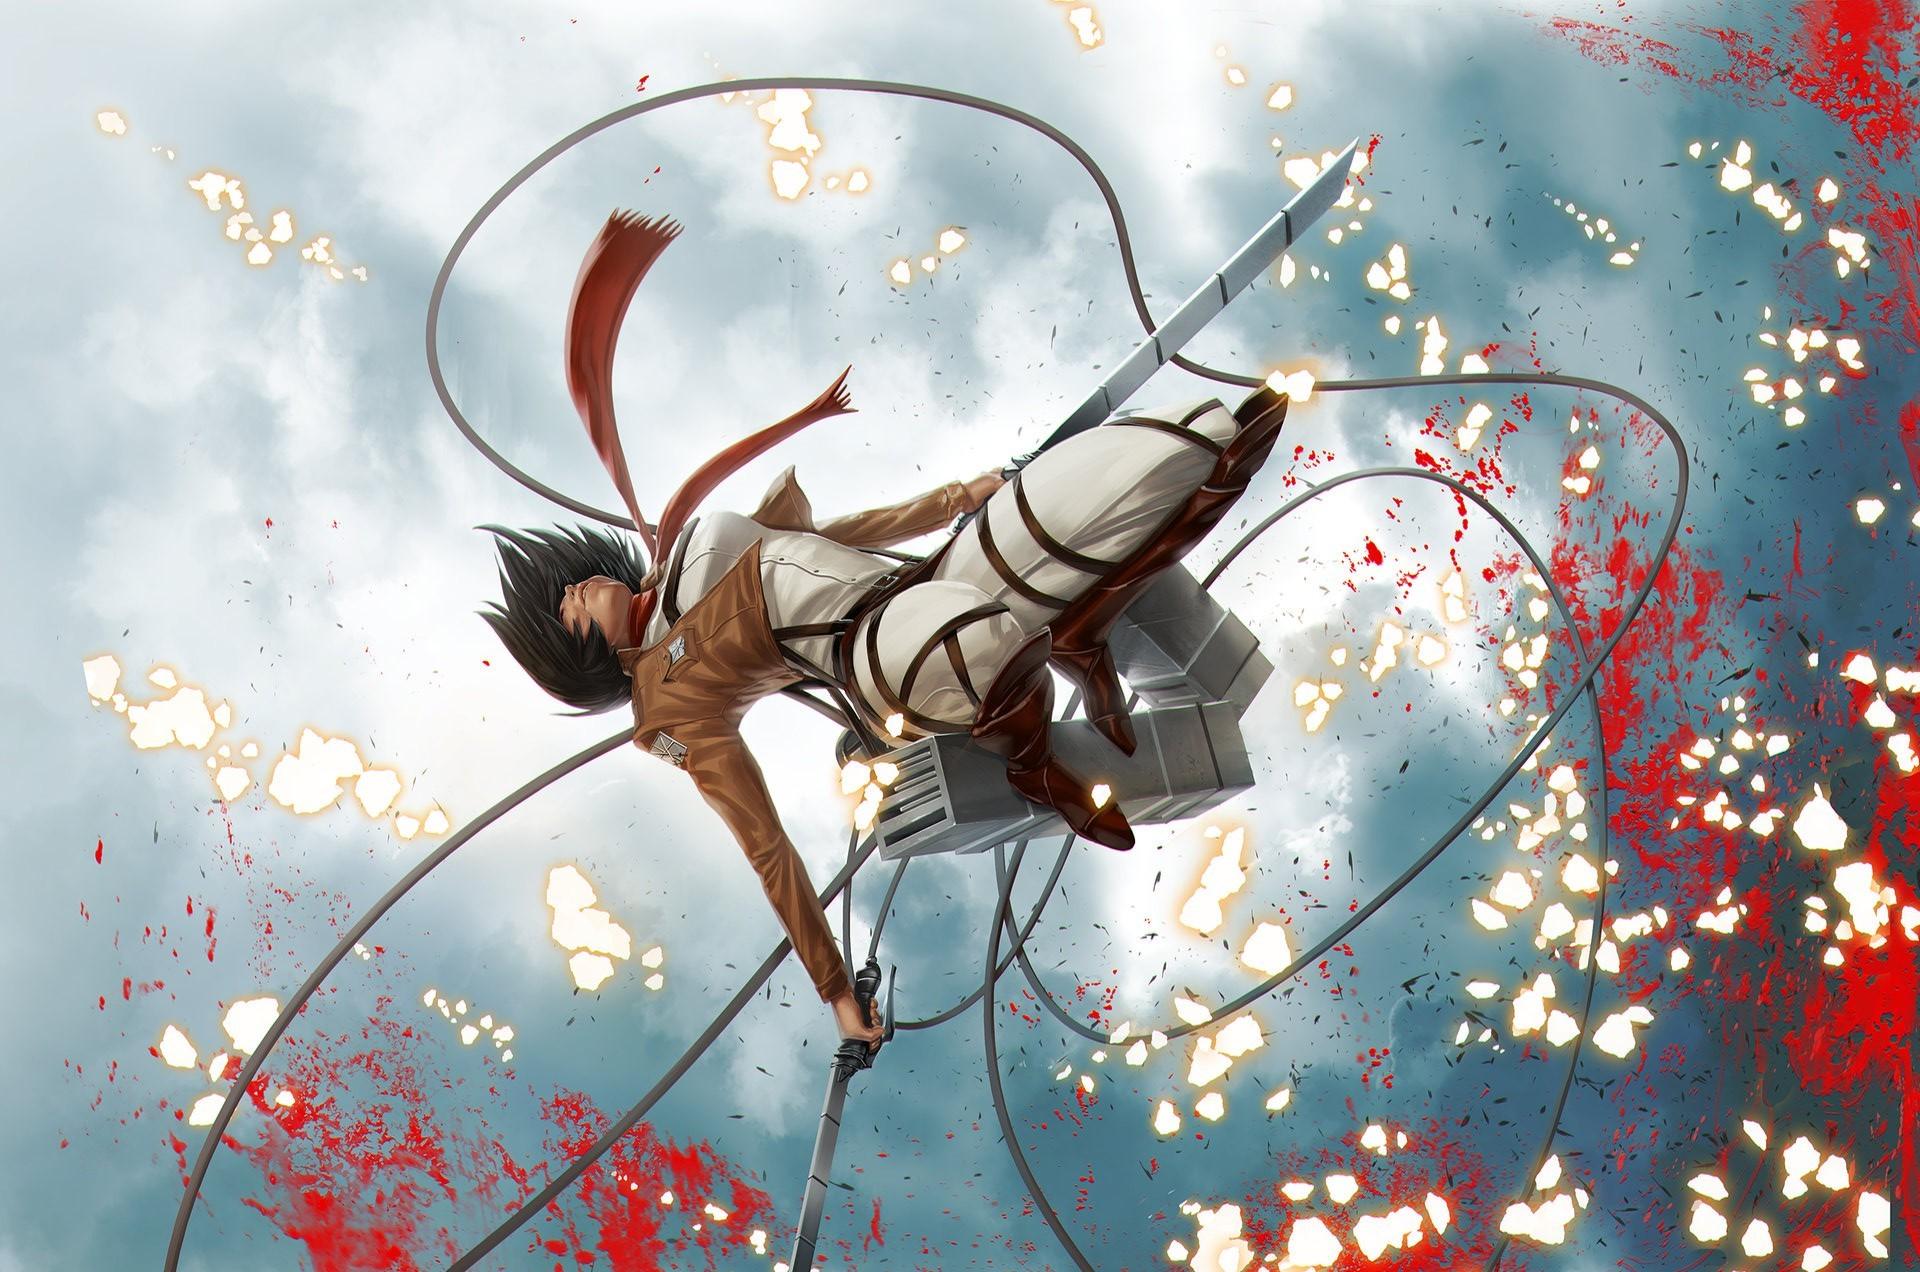 Shingeki No Kyojin Mikasa Ackerman Wallpapers Hd Shingeki No Kyojin Wallpaper Mikasa 1920x1272 Wallpaper Teahub Io